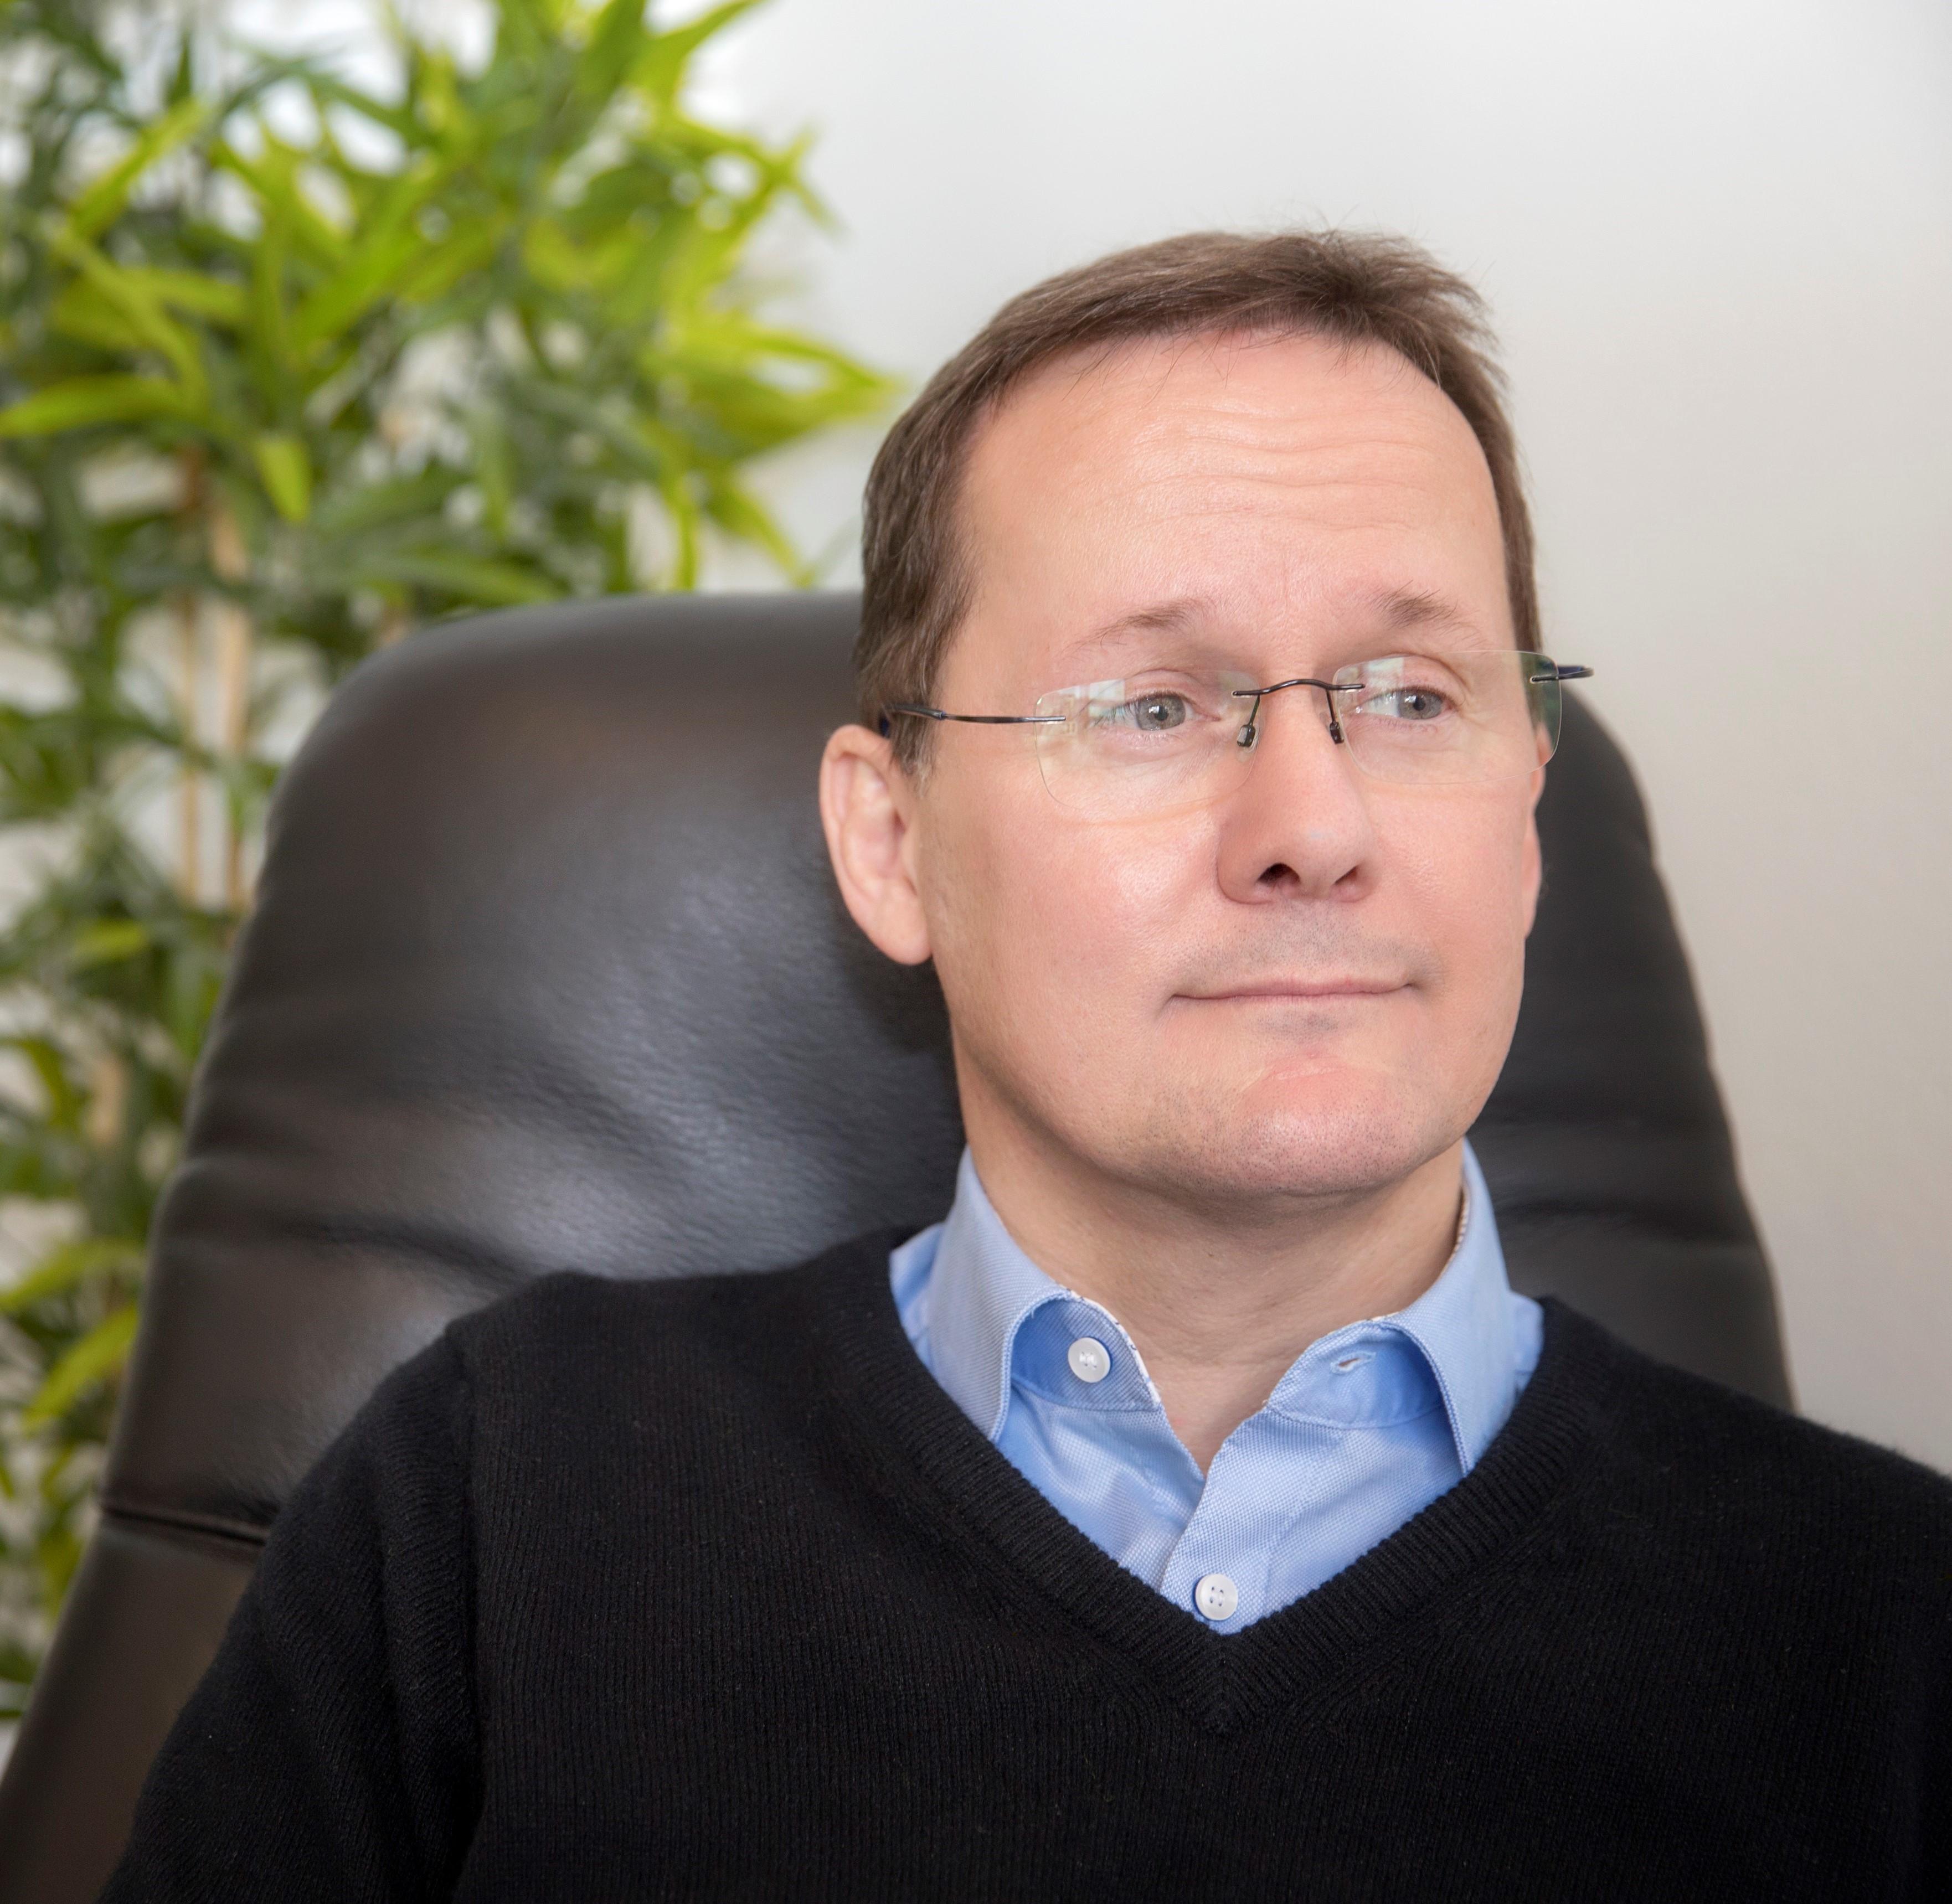 Allan Fohlmann